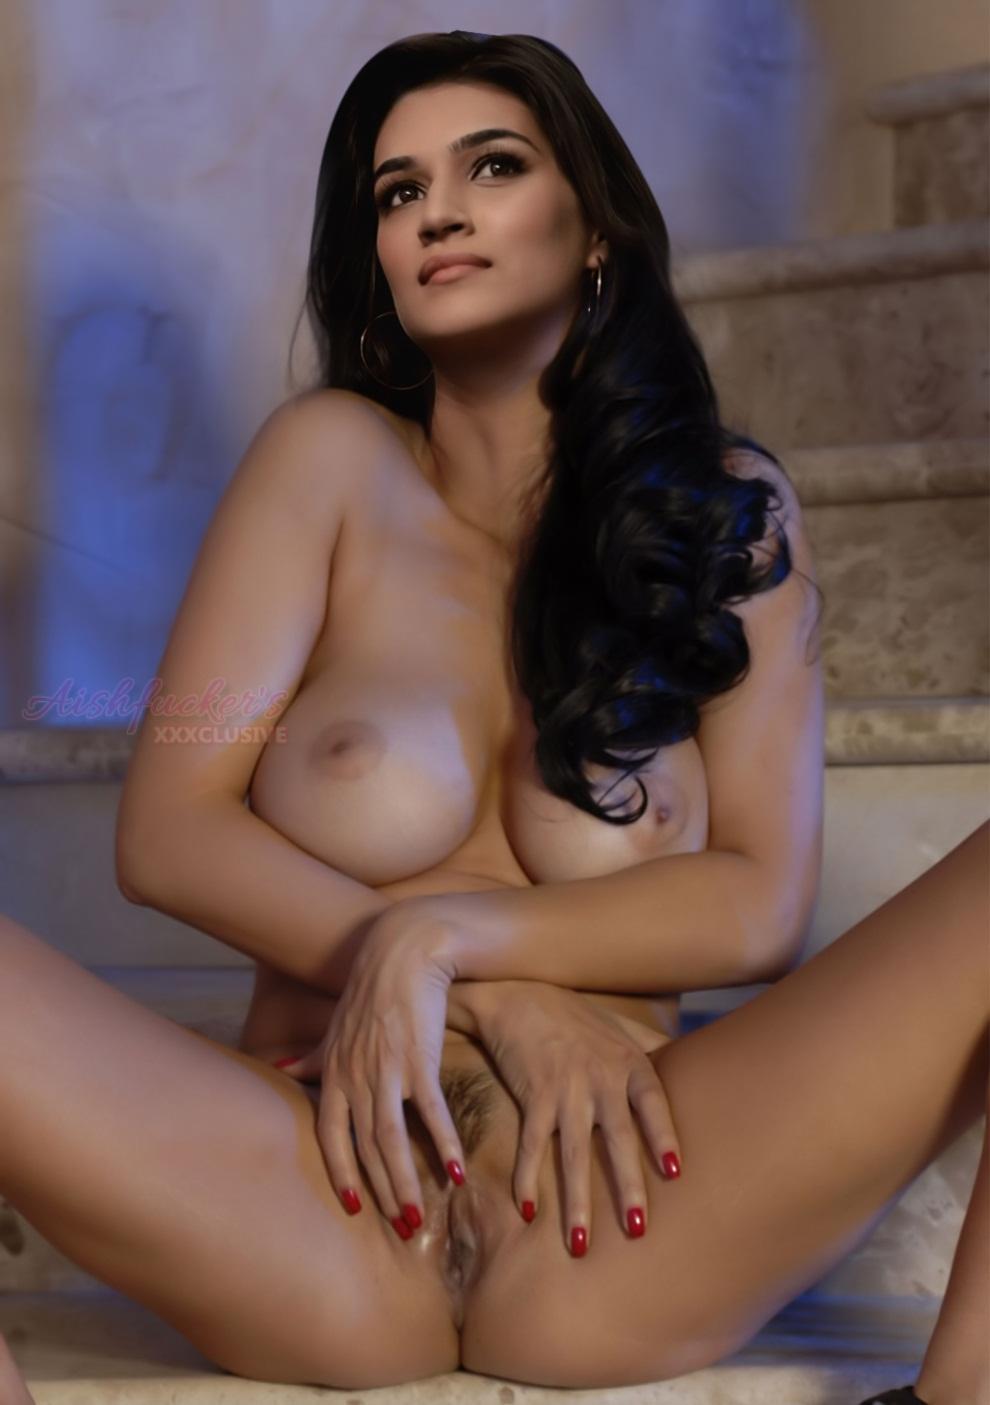 Anna michelle walters teacher nude leaked